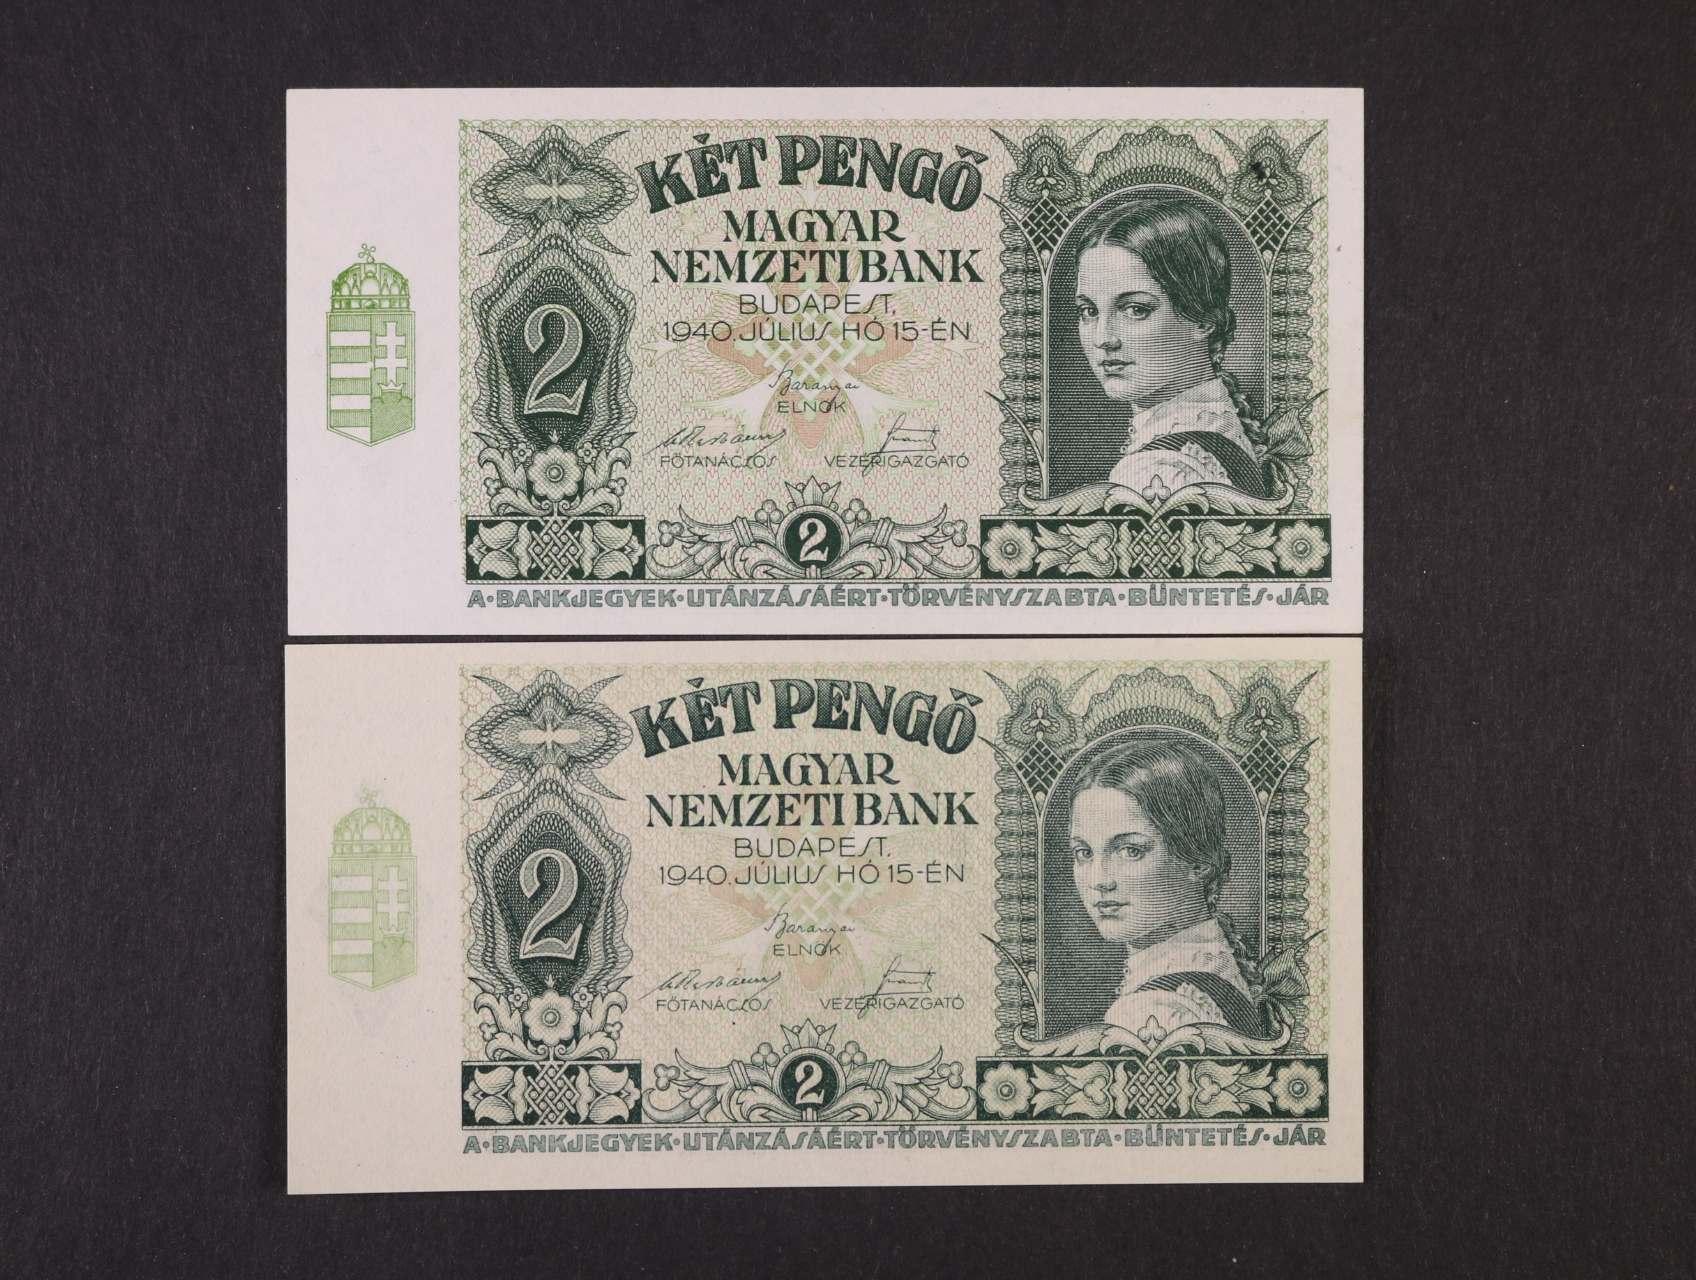 2 Pengö 15.7.1940 série J 799 bílý papír a J 160 žlutý papír, platné na ČS území, Pi. 108, Ba. H2a, 2b, 2ks